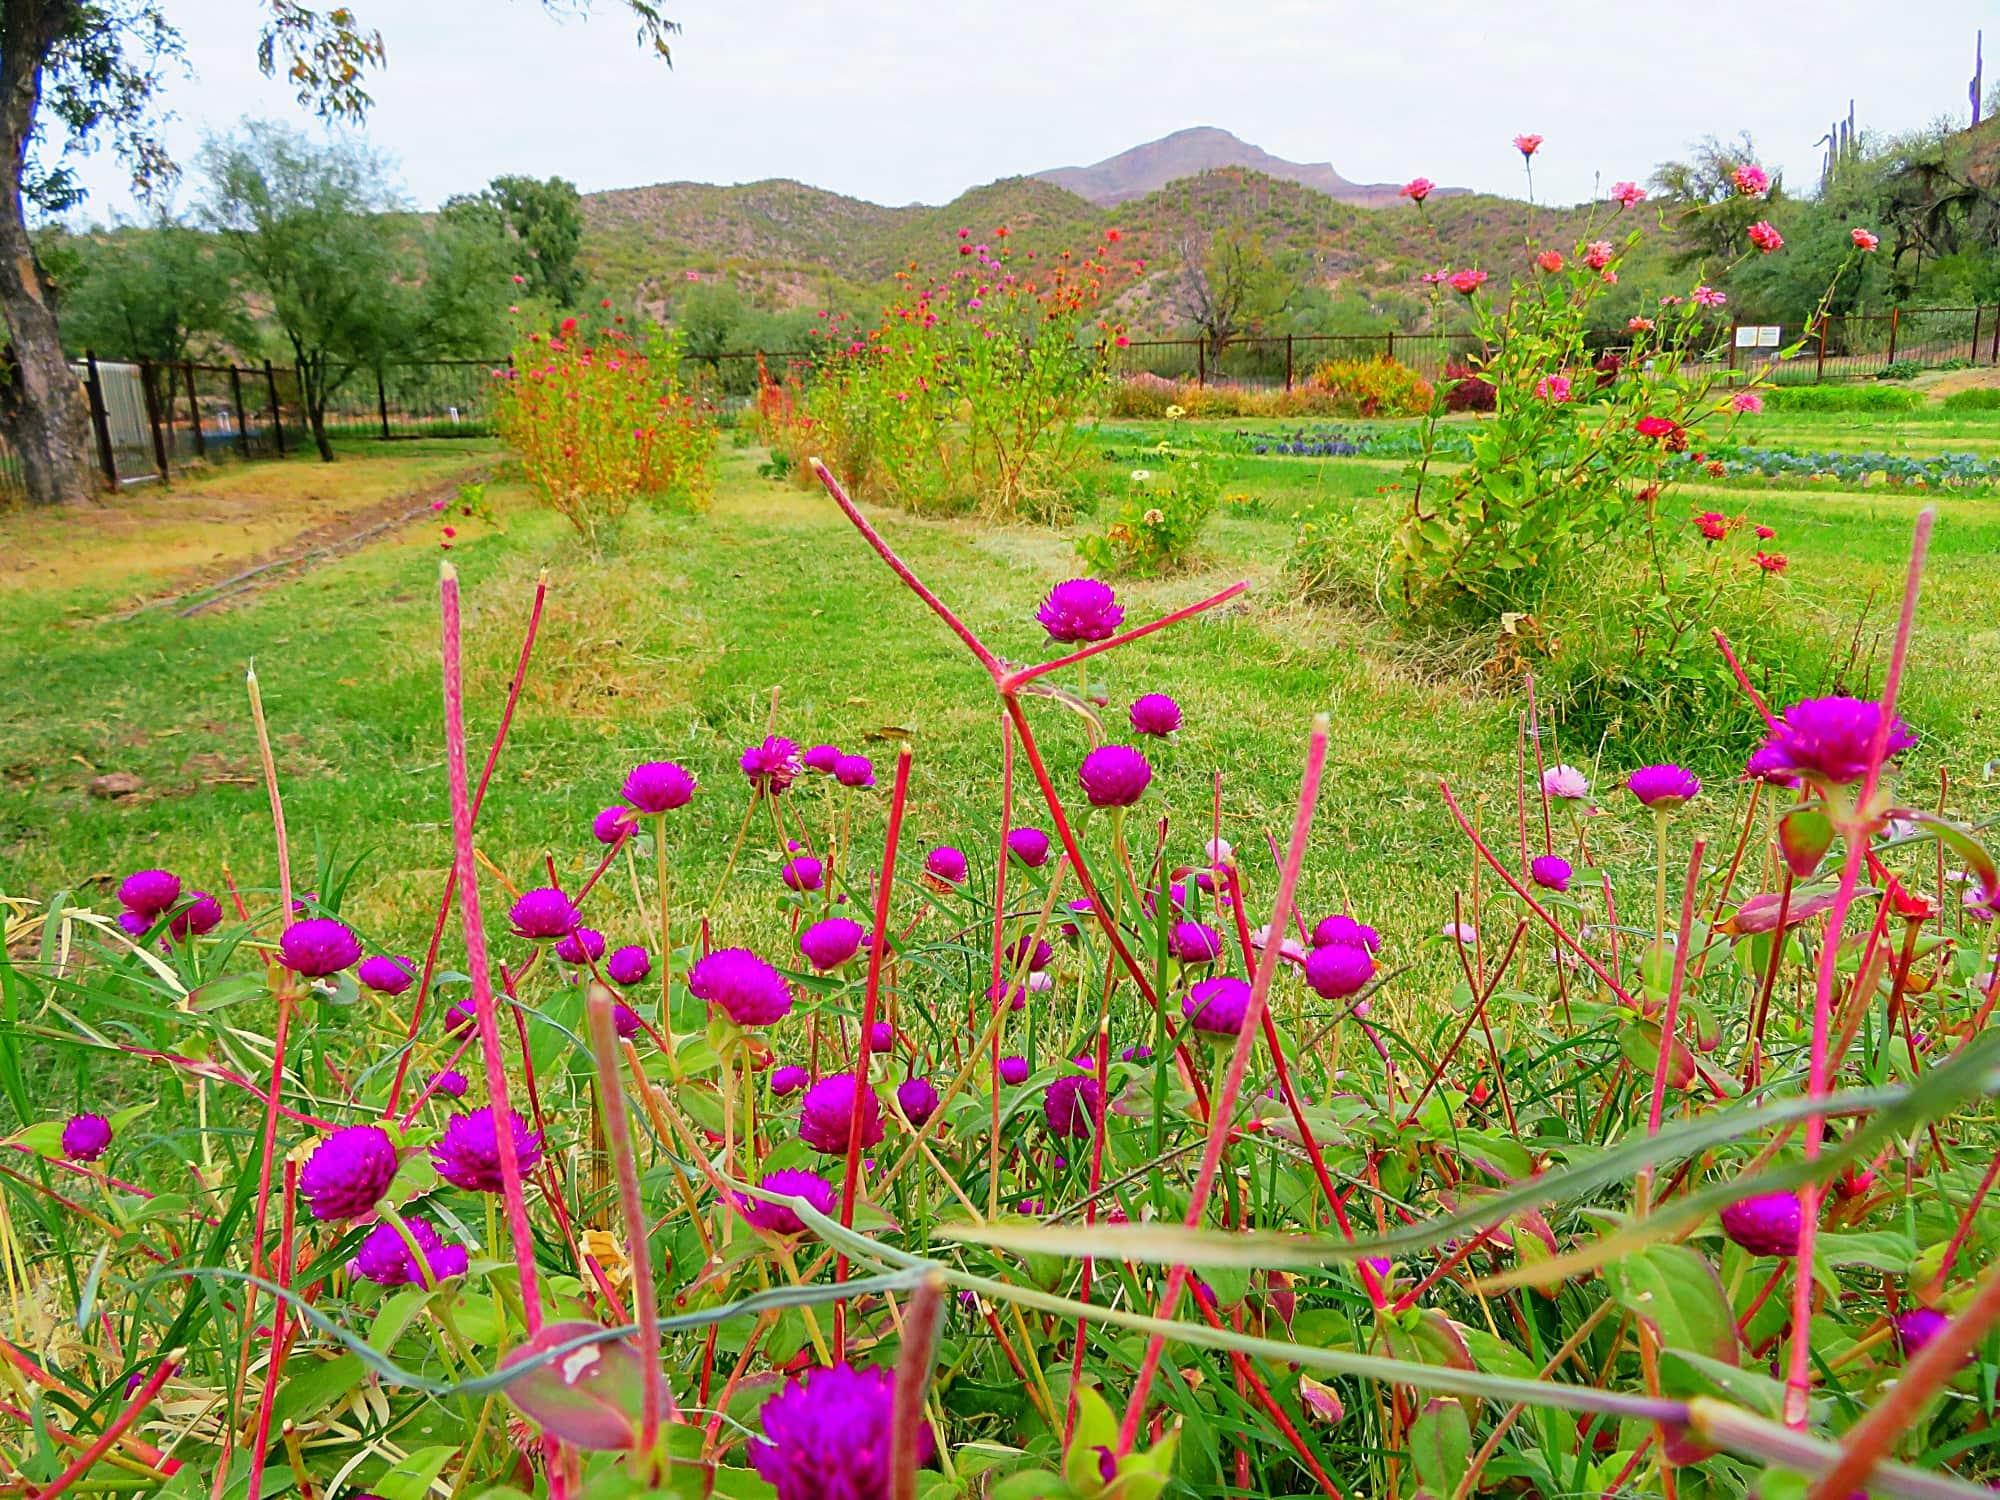 Purple flowers at Aravaipa Farms Inn